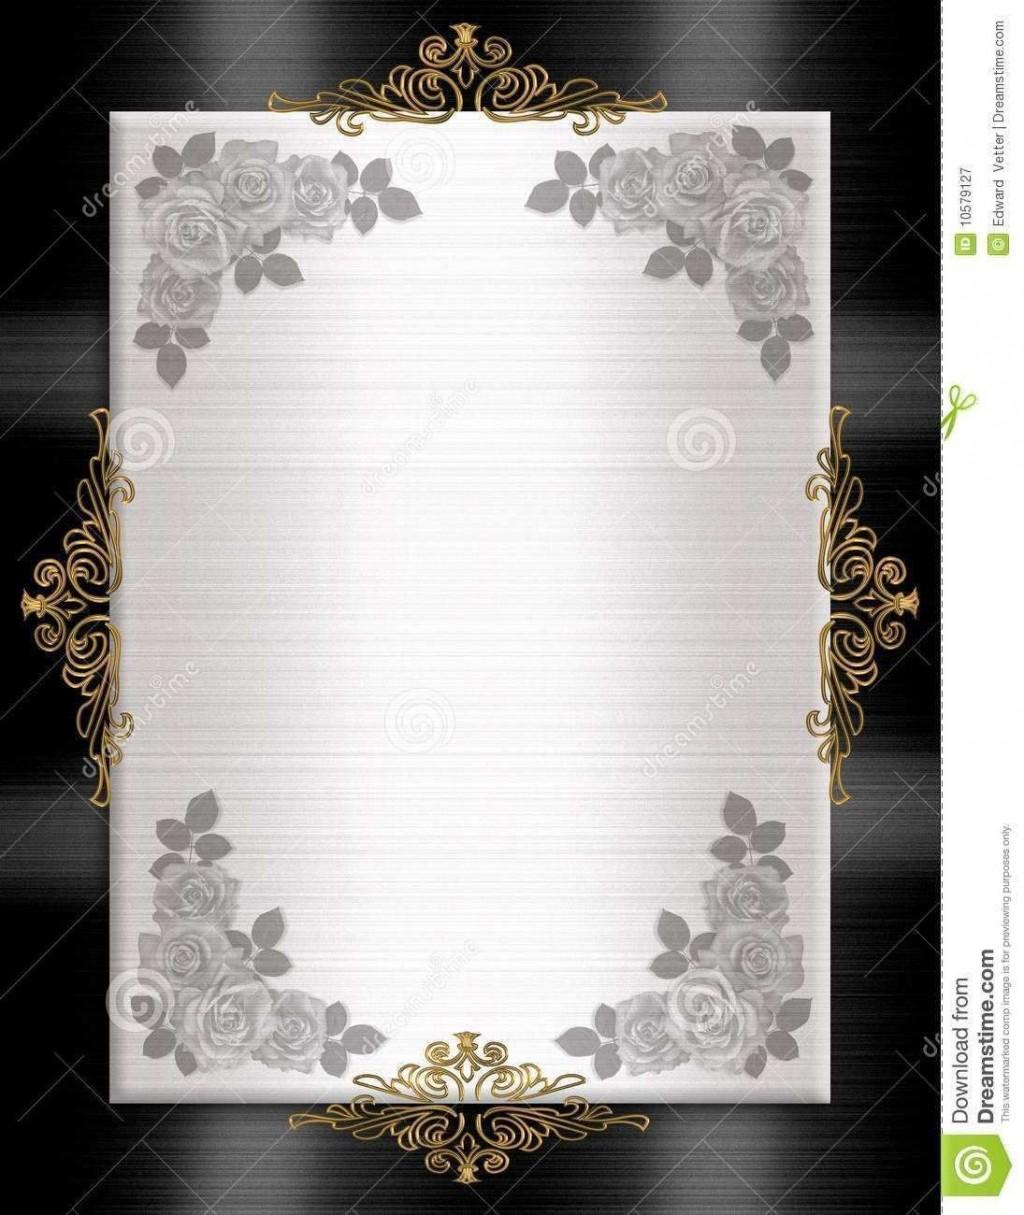 001 Wonderful Black And Gold Invitation Template Sample  Design White Free PrintableLarge